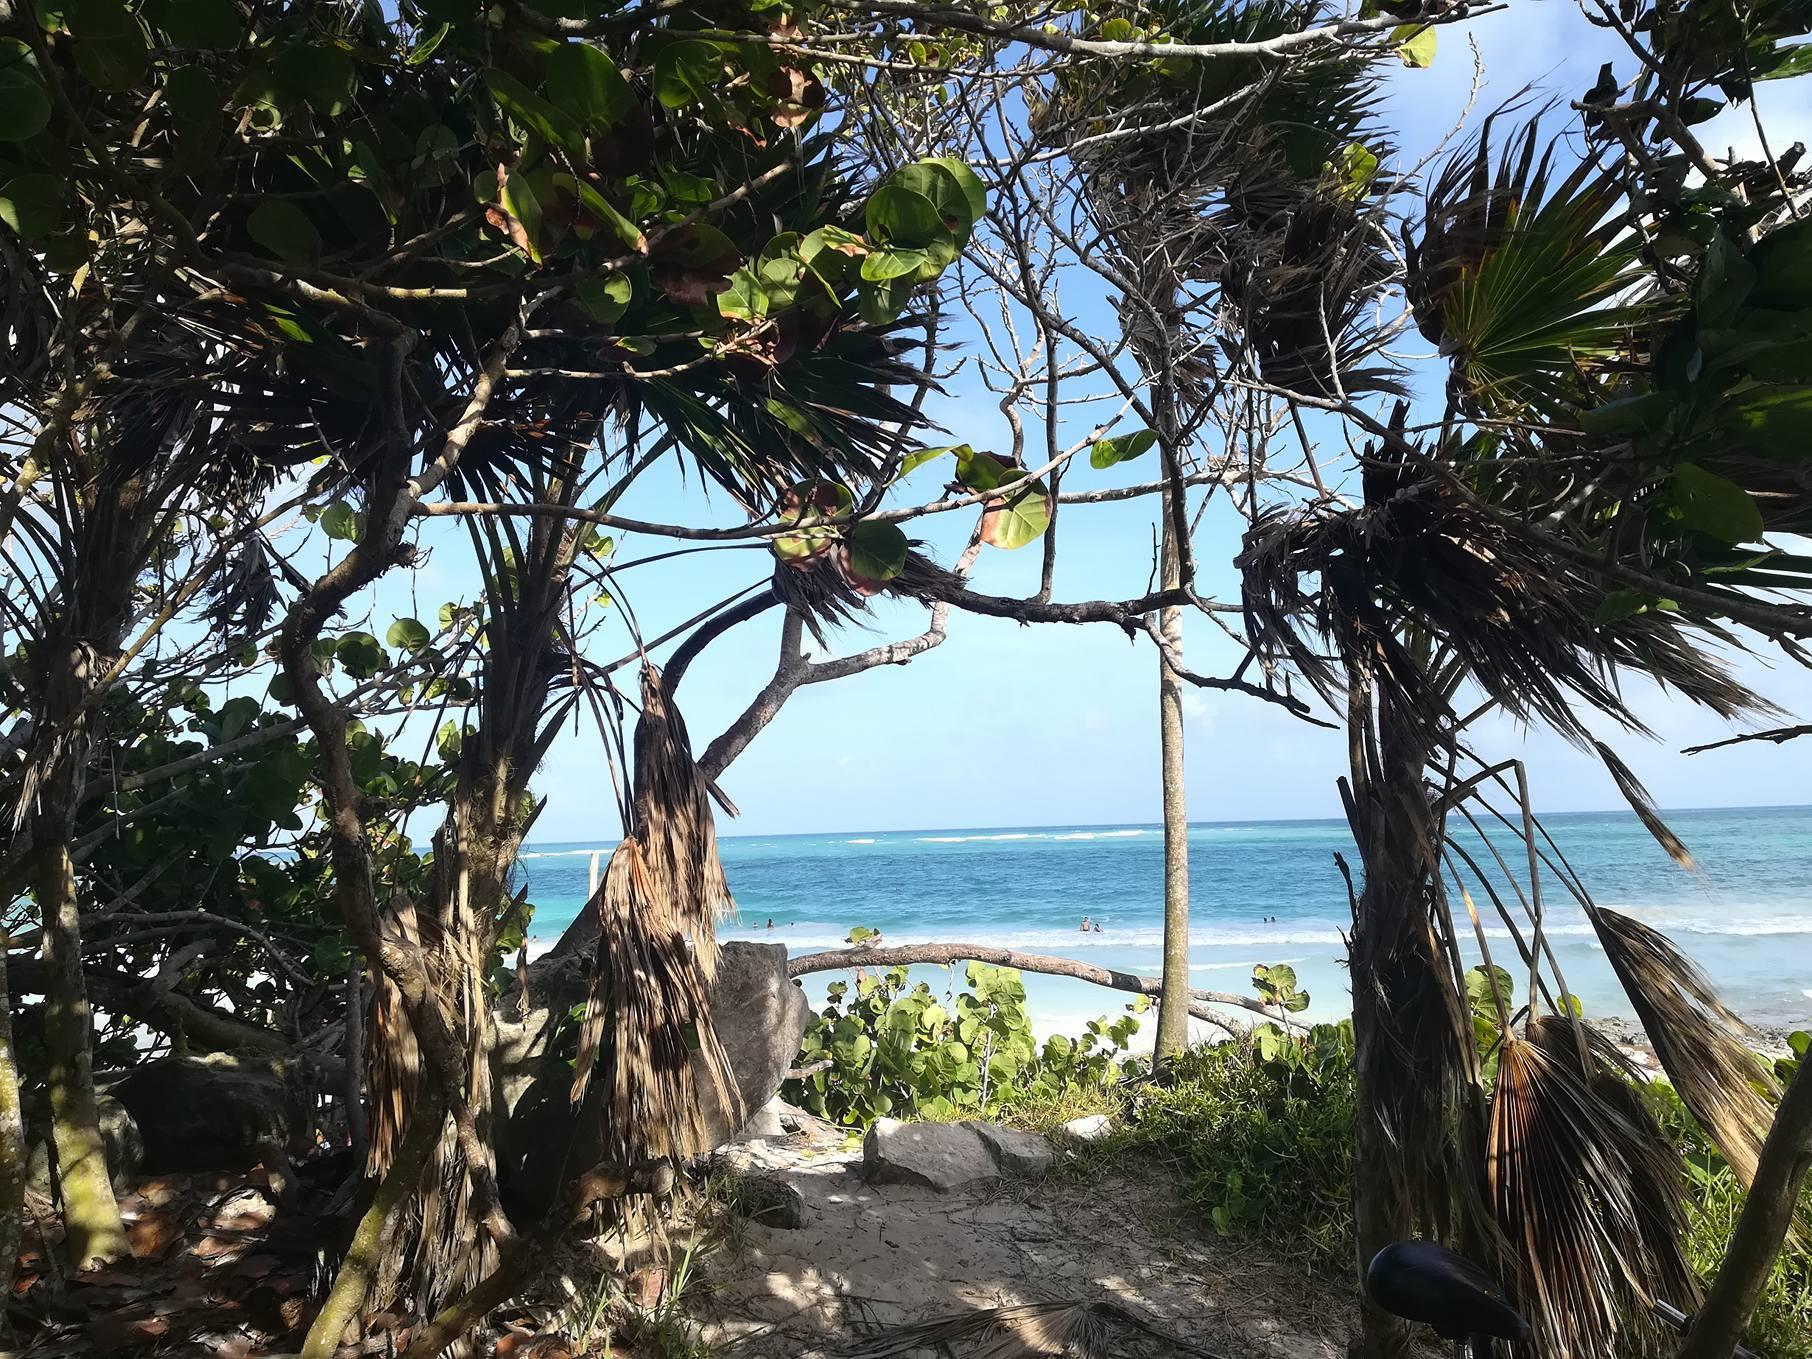 Tulum: spiagge caraibiche e rovine maya